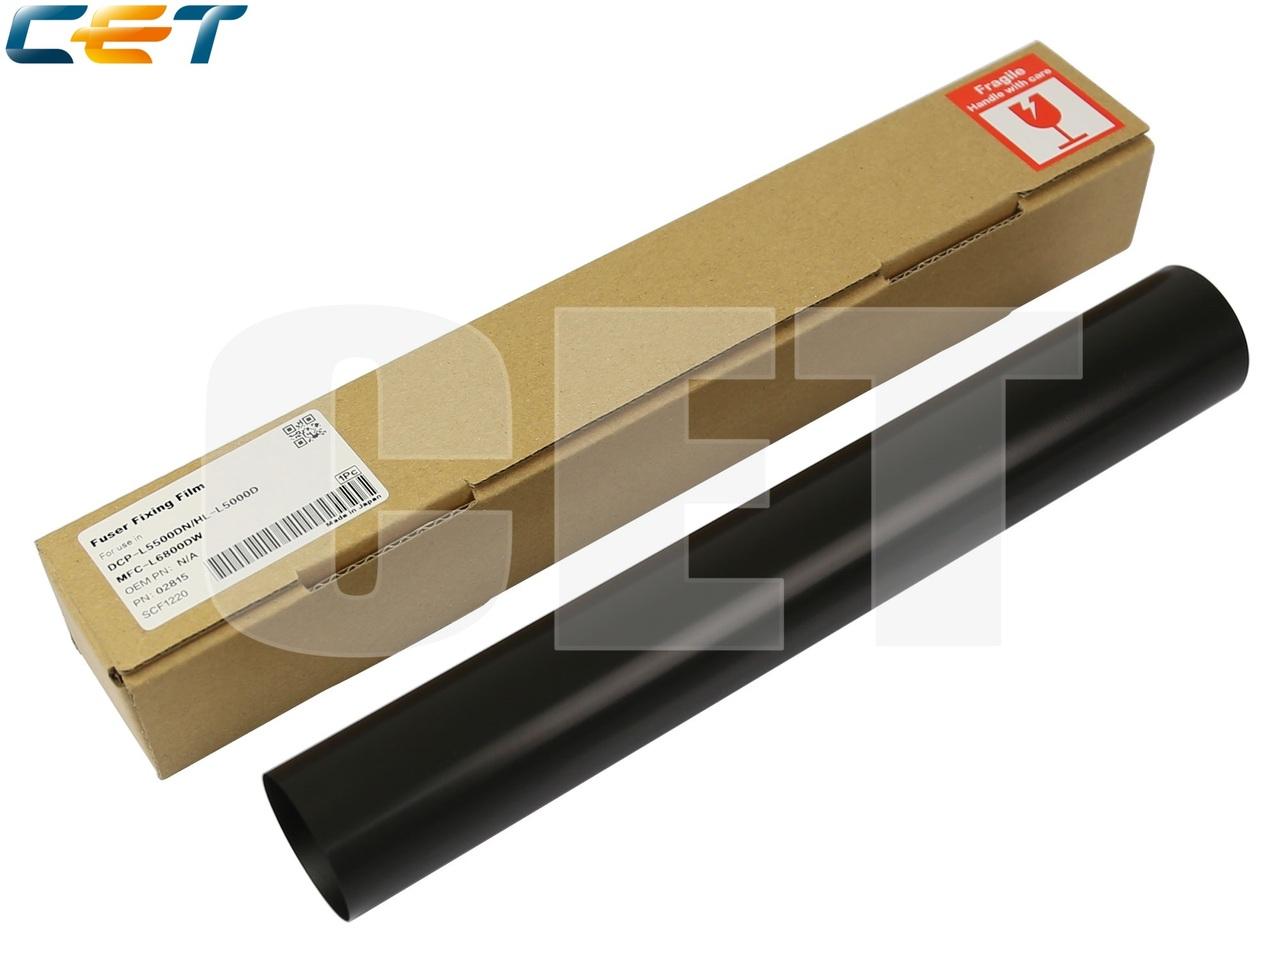 Термопленка для BROTHER HL-L5000D/L5100DN/L5200DW,DCP-L5500DN, MFC-L5700DN/L6900DW (CET), CET2815